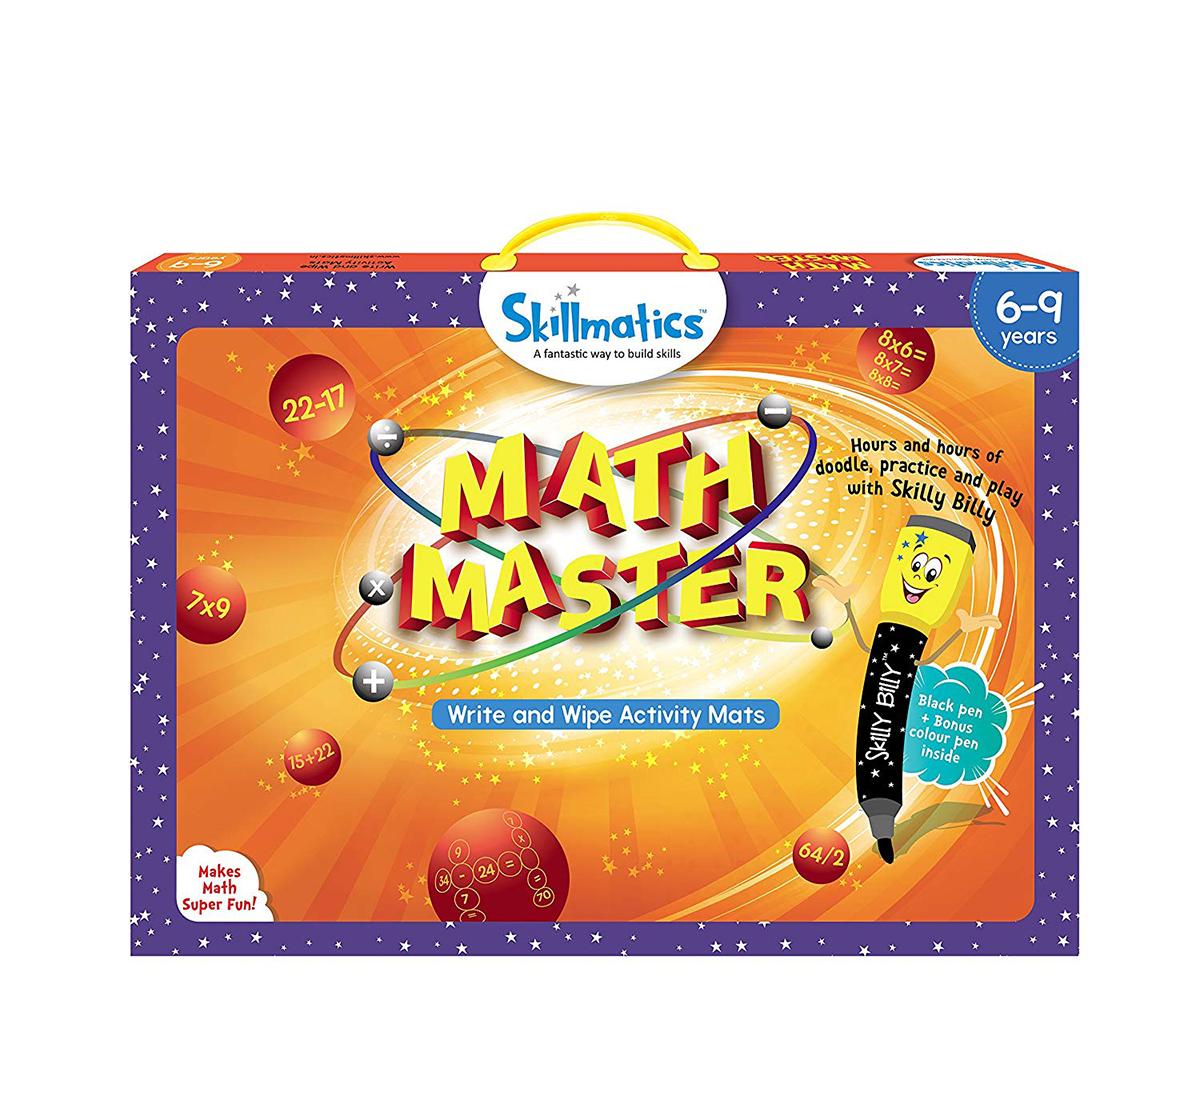 Skillmatics    Skillmatics Educational Game : Math Master Games for Kids age 6Y+